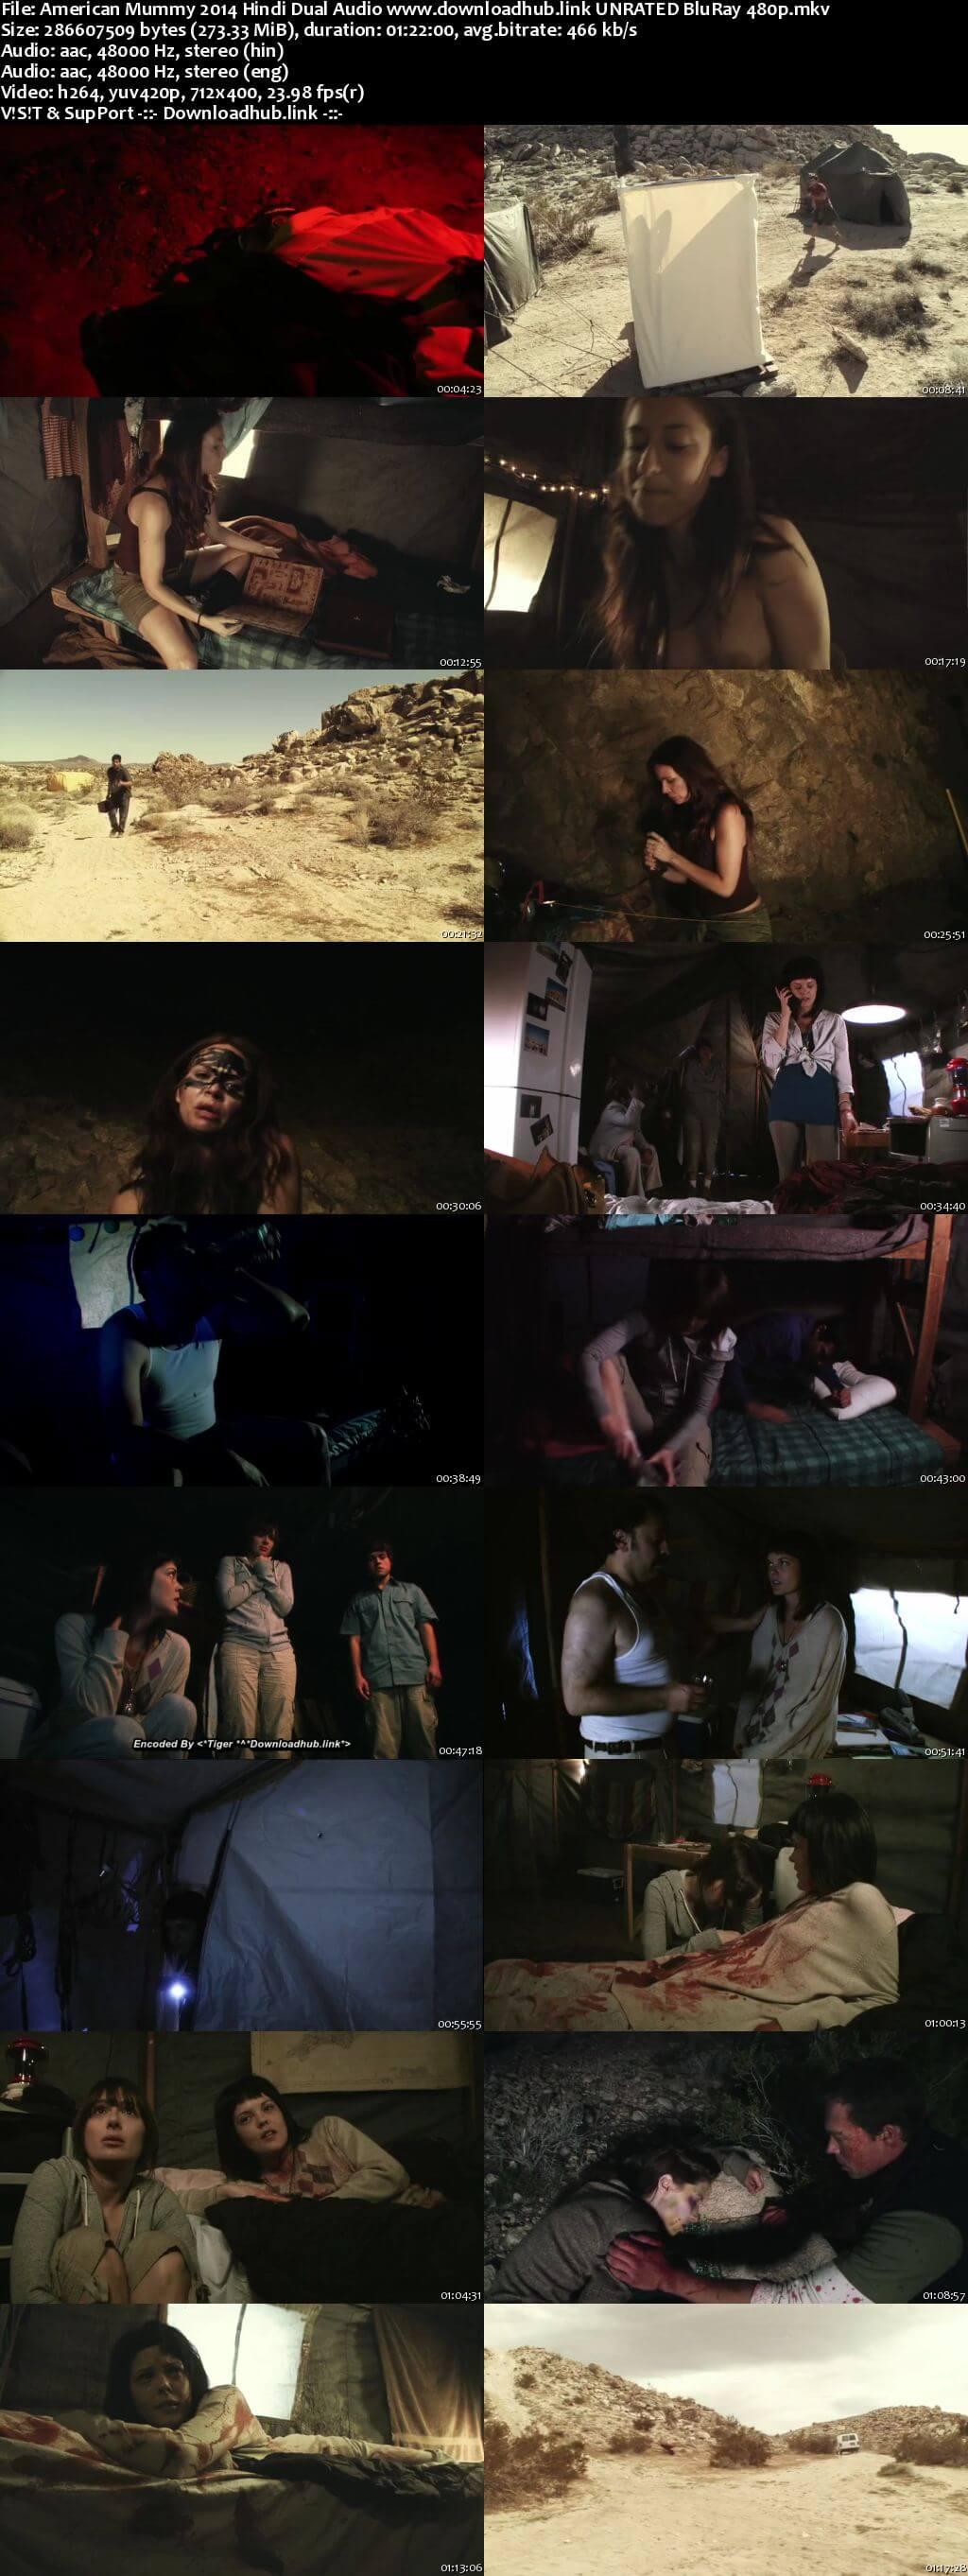 American Mummy 2014 Hindi Dual Audio 270MB UNRATED BluRay 480p